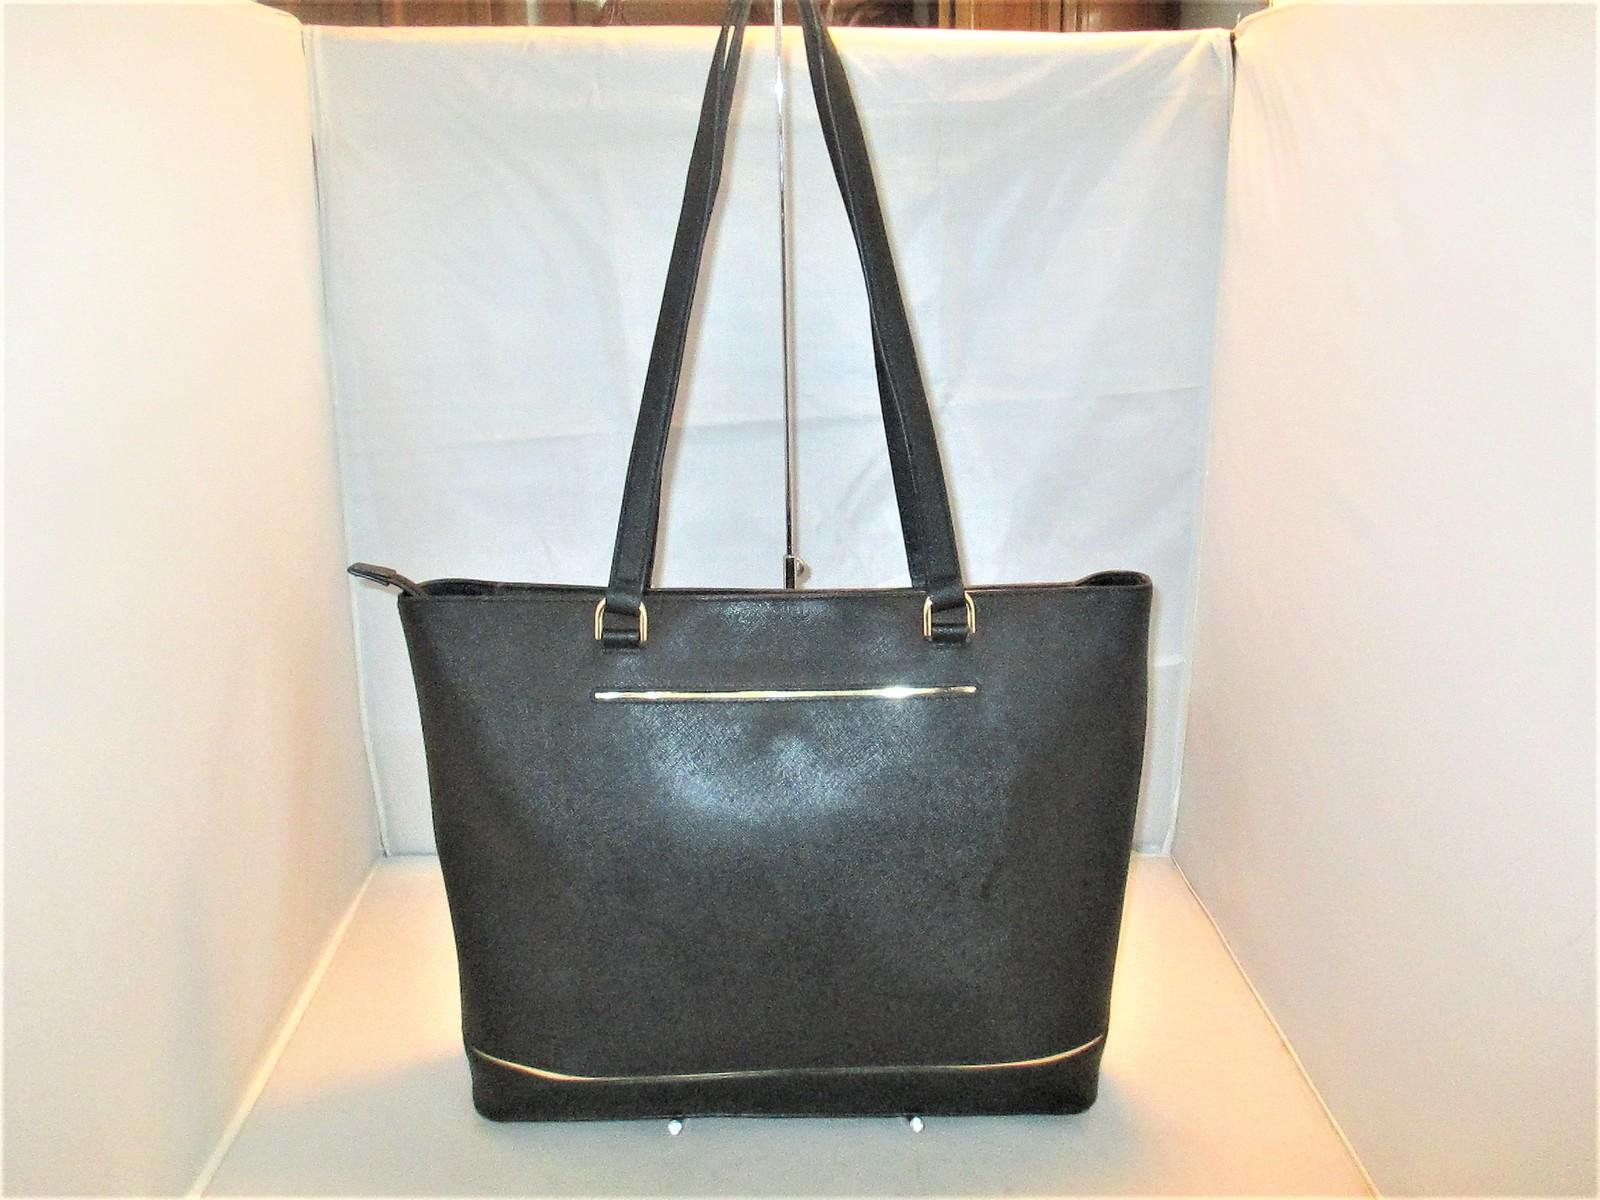 ead4d895e1e6 Michael Kors Handbag Frame Out Large and 50 similar items